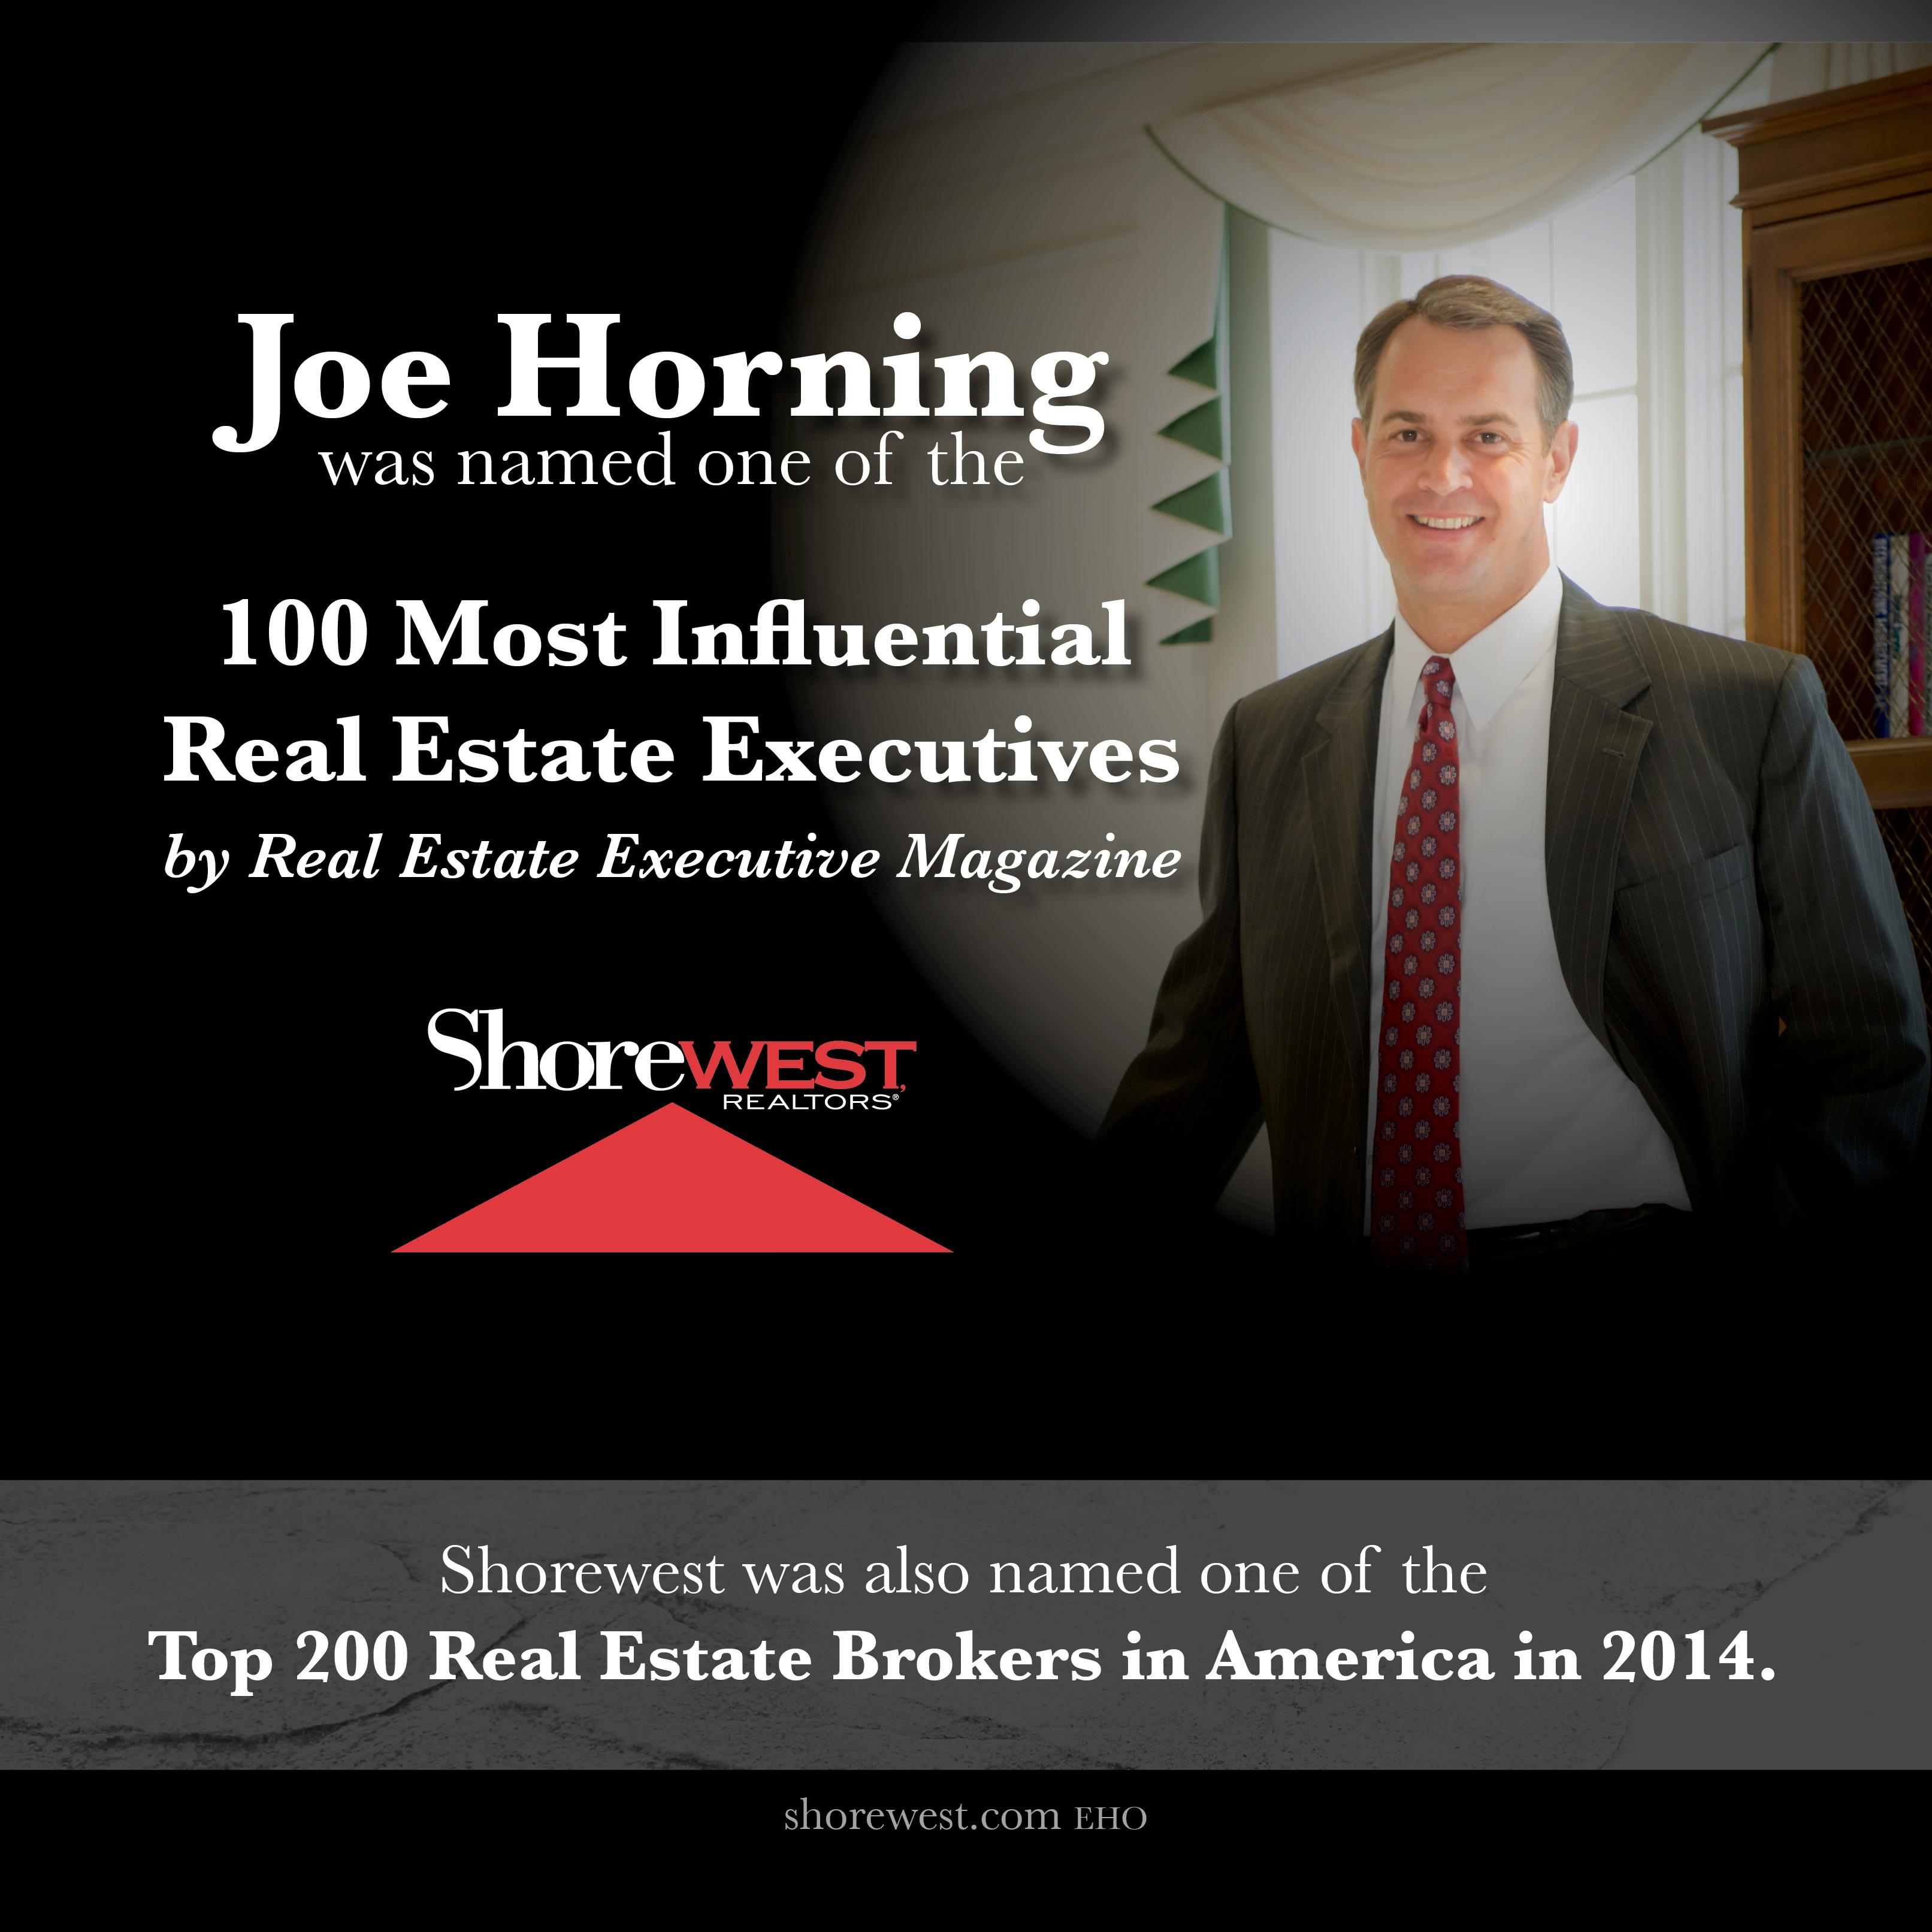 Joe Horning RE Exec Magazine share 1014